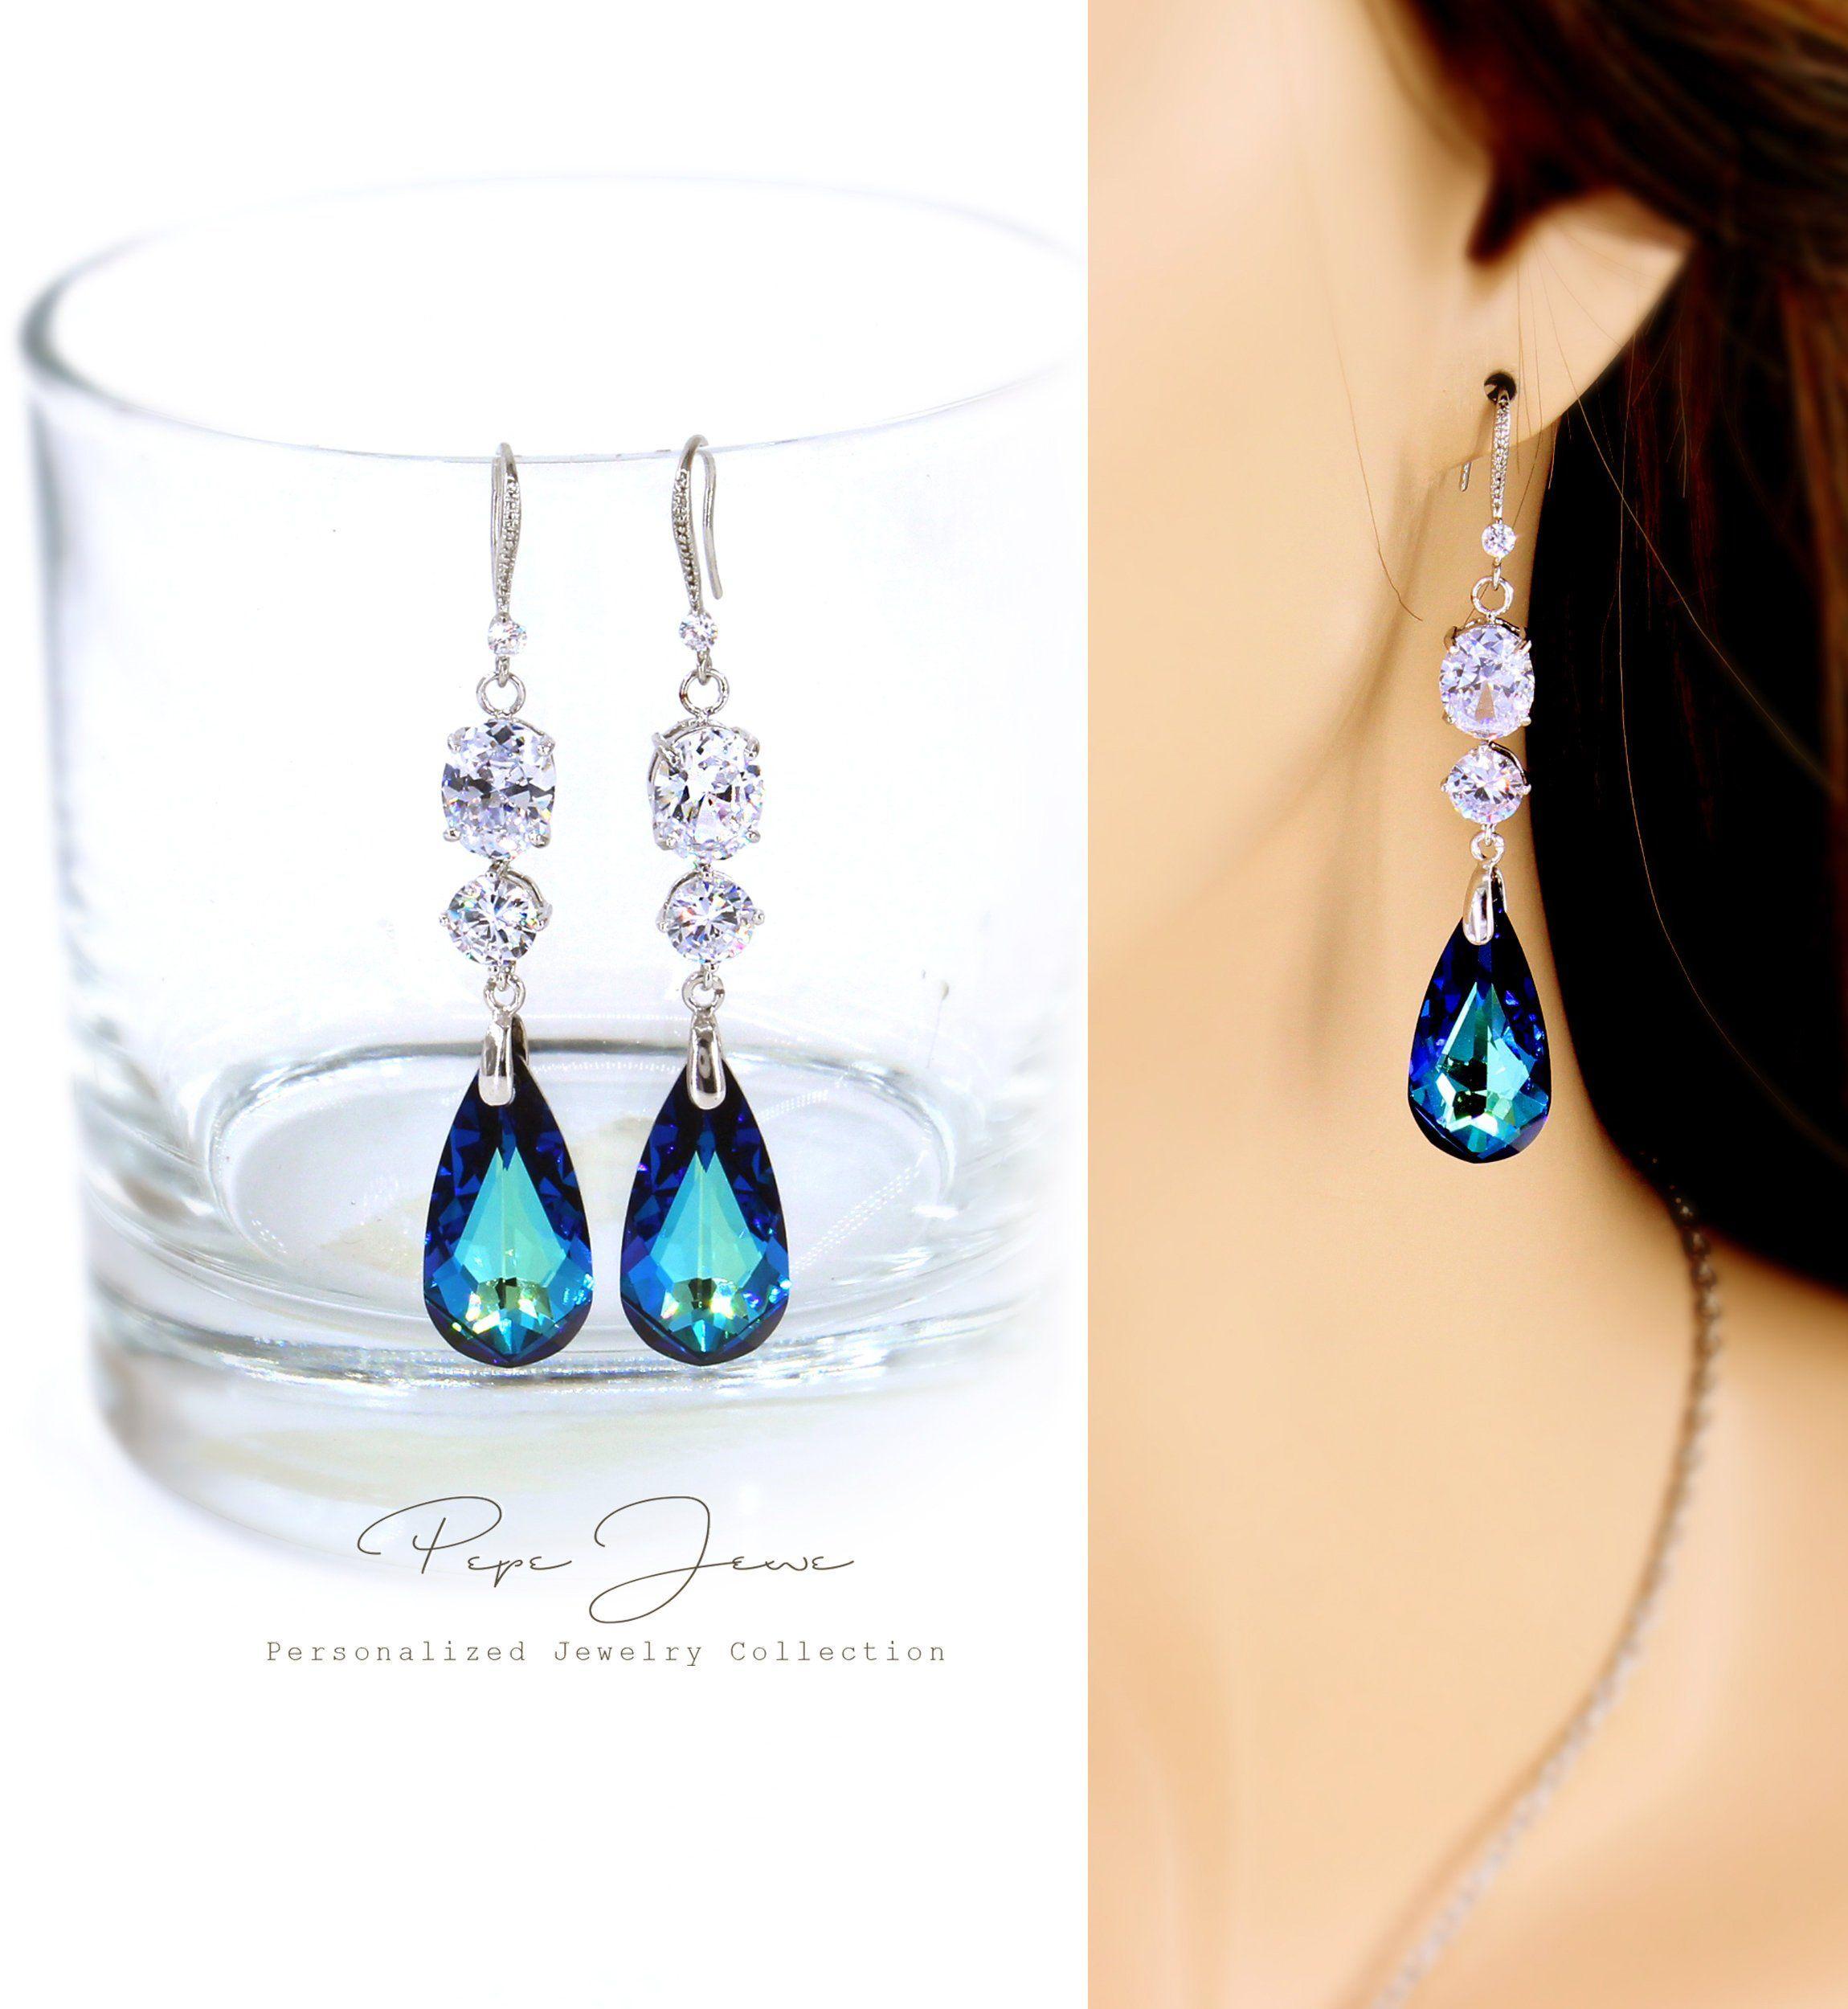 Wedding Earrings Navy blue Zirconia Earrings Bridesmaid Earrings Gift Crystal Bridal Earrings Wedding Accessory Teardrop Earrings Bao